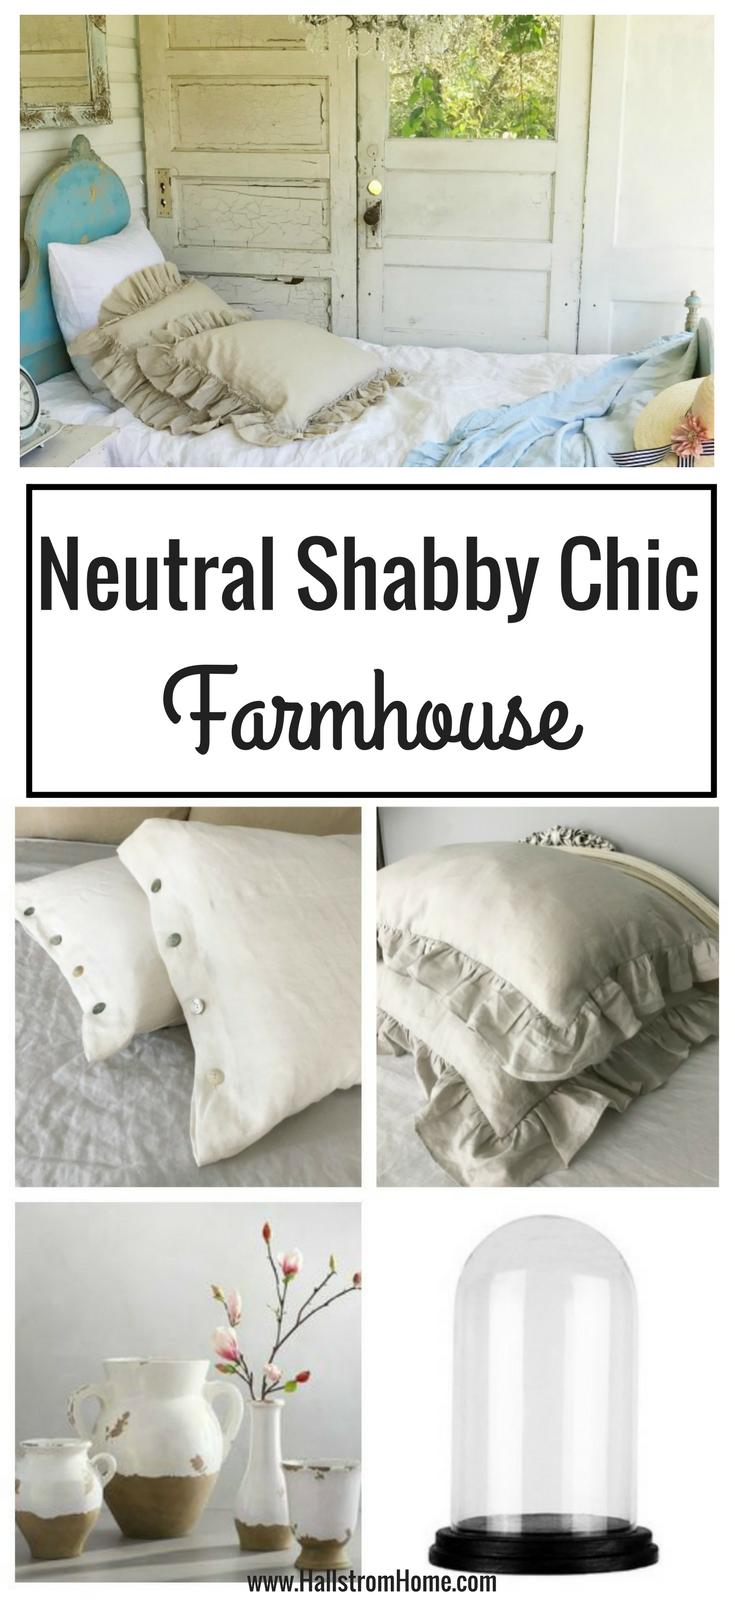 My Neutral Shabby Chic Farmhouse